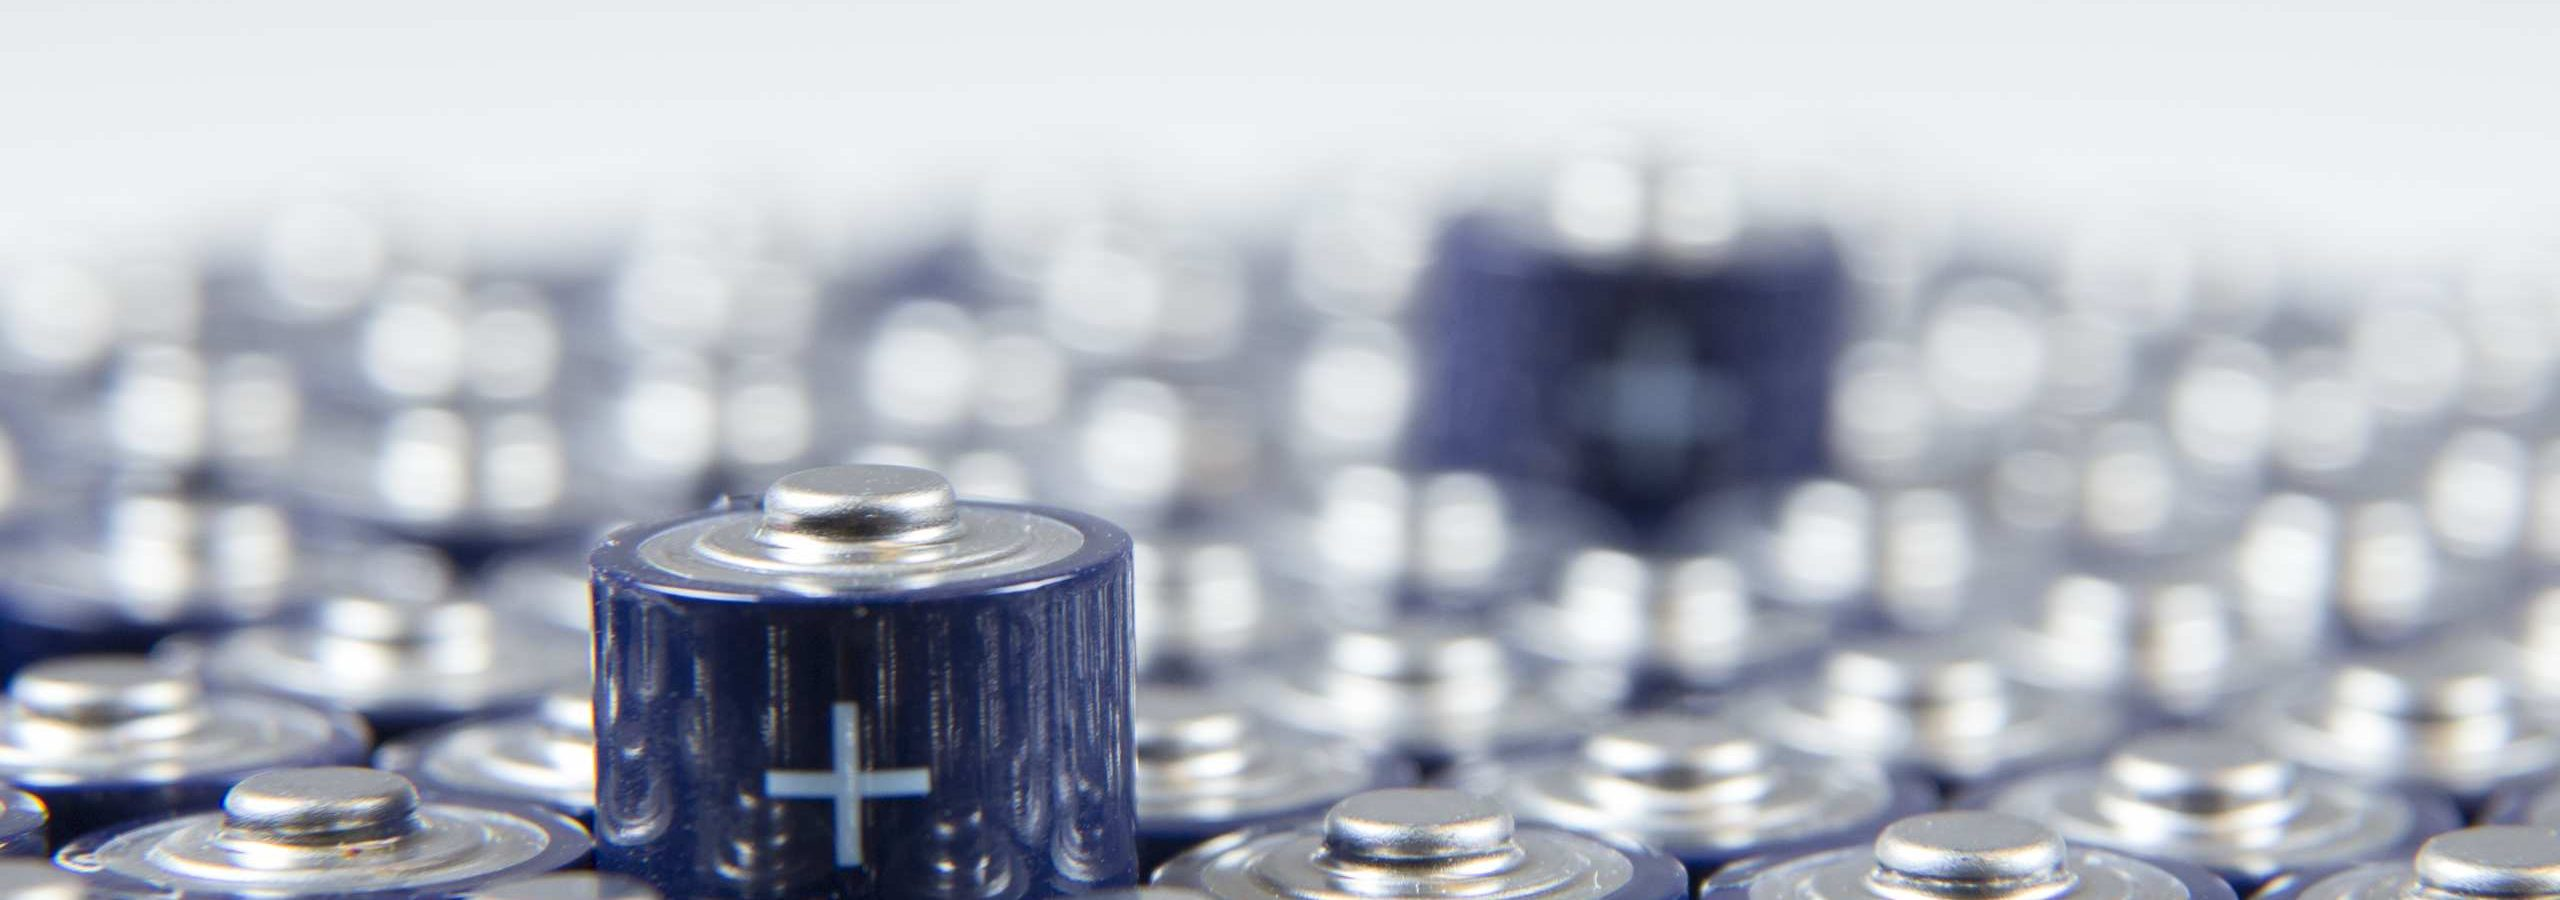 H&T Batteries | H&T Battery Components for Alkaline Batteries